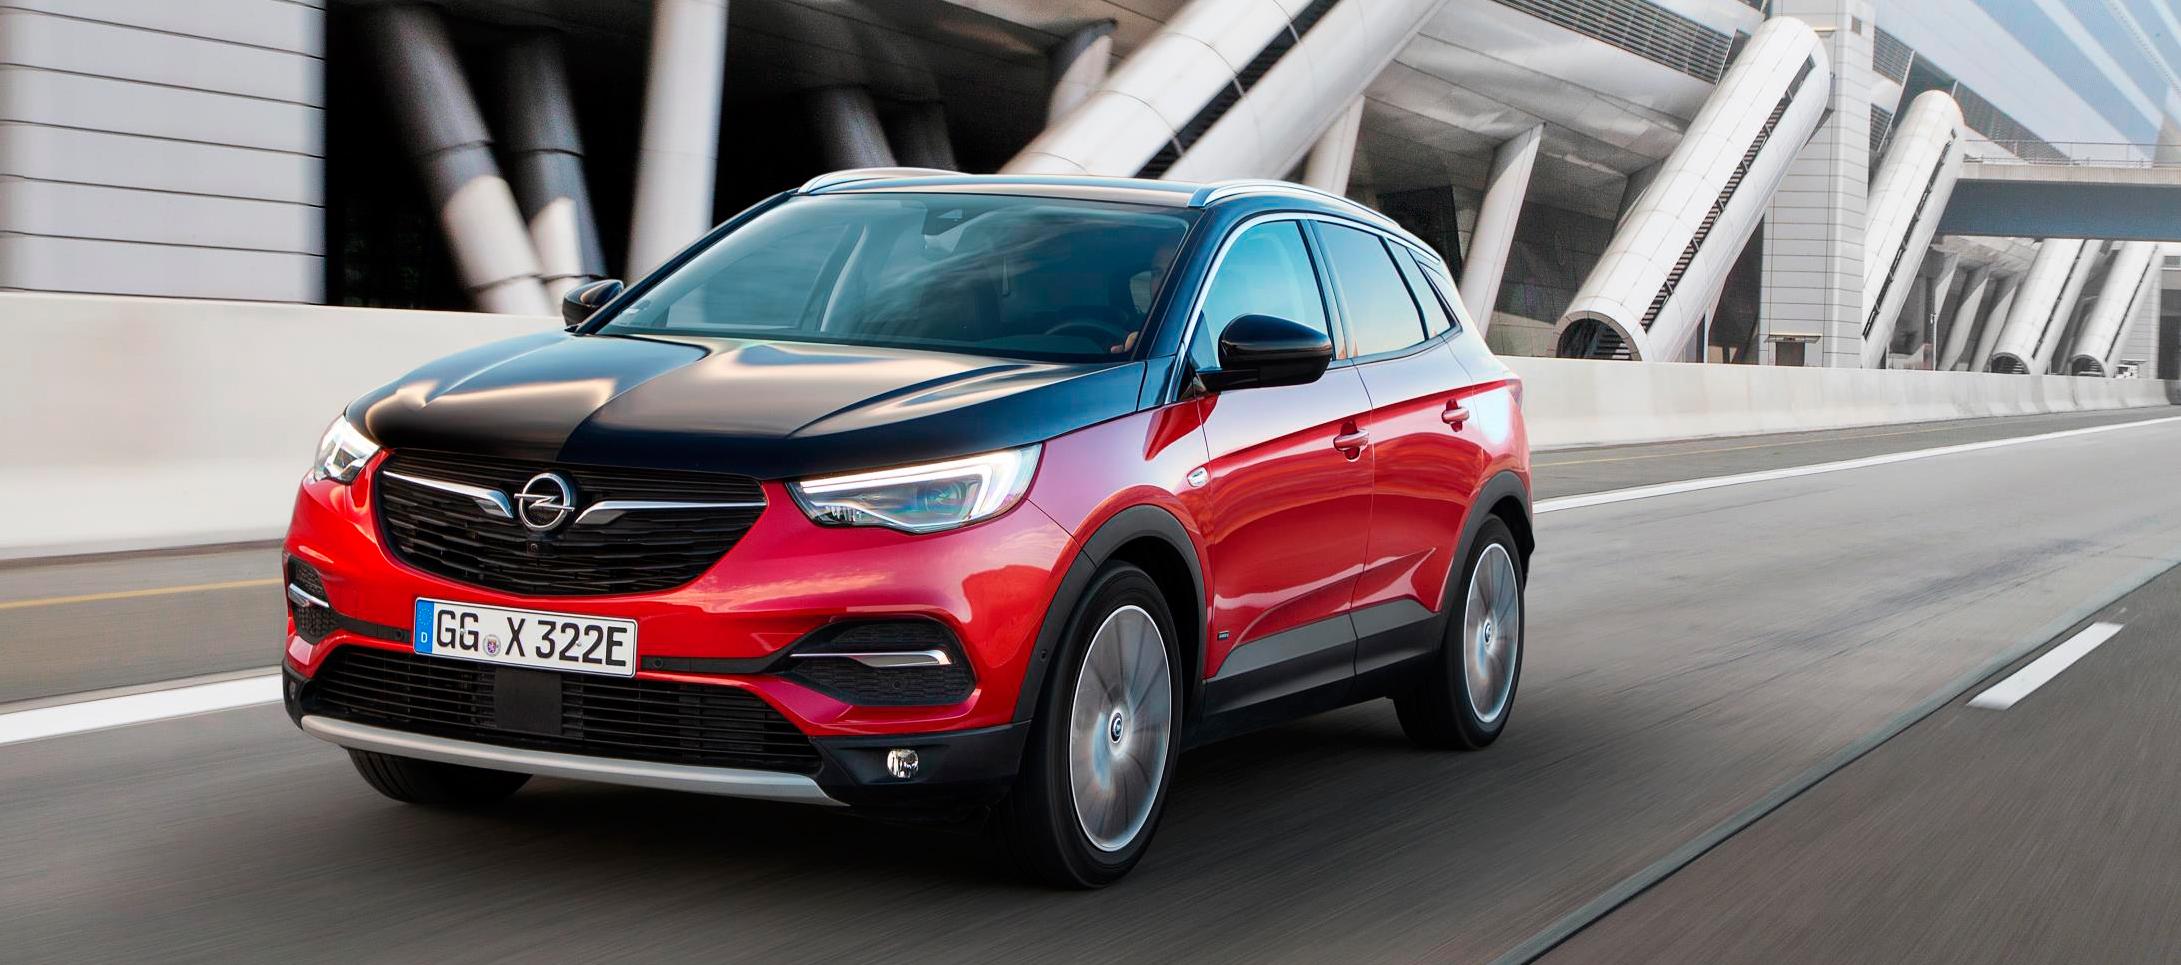 Opel Grandland X, SUV con carácter aventurero